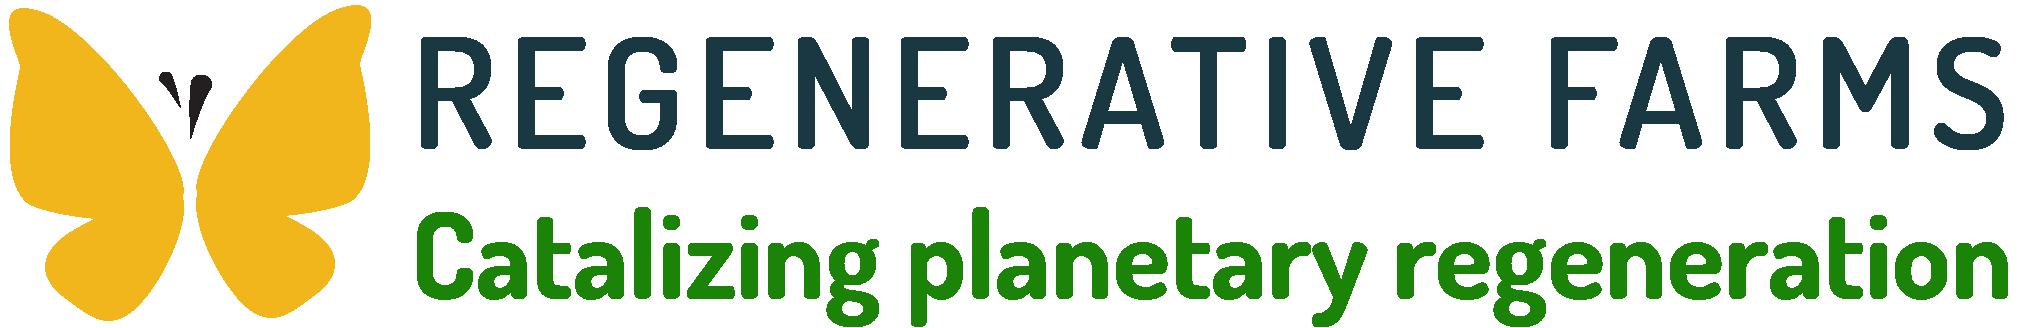 Regenerative Farms